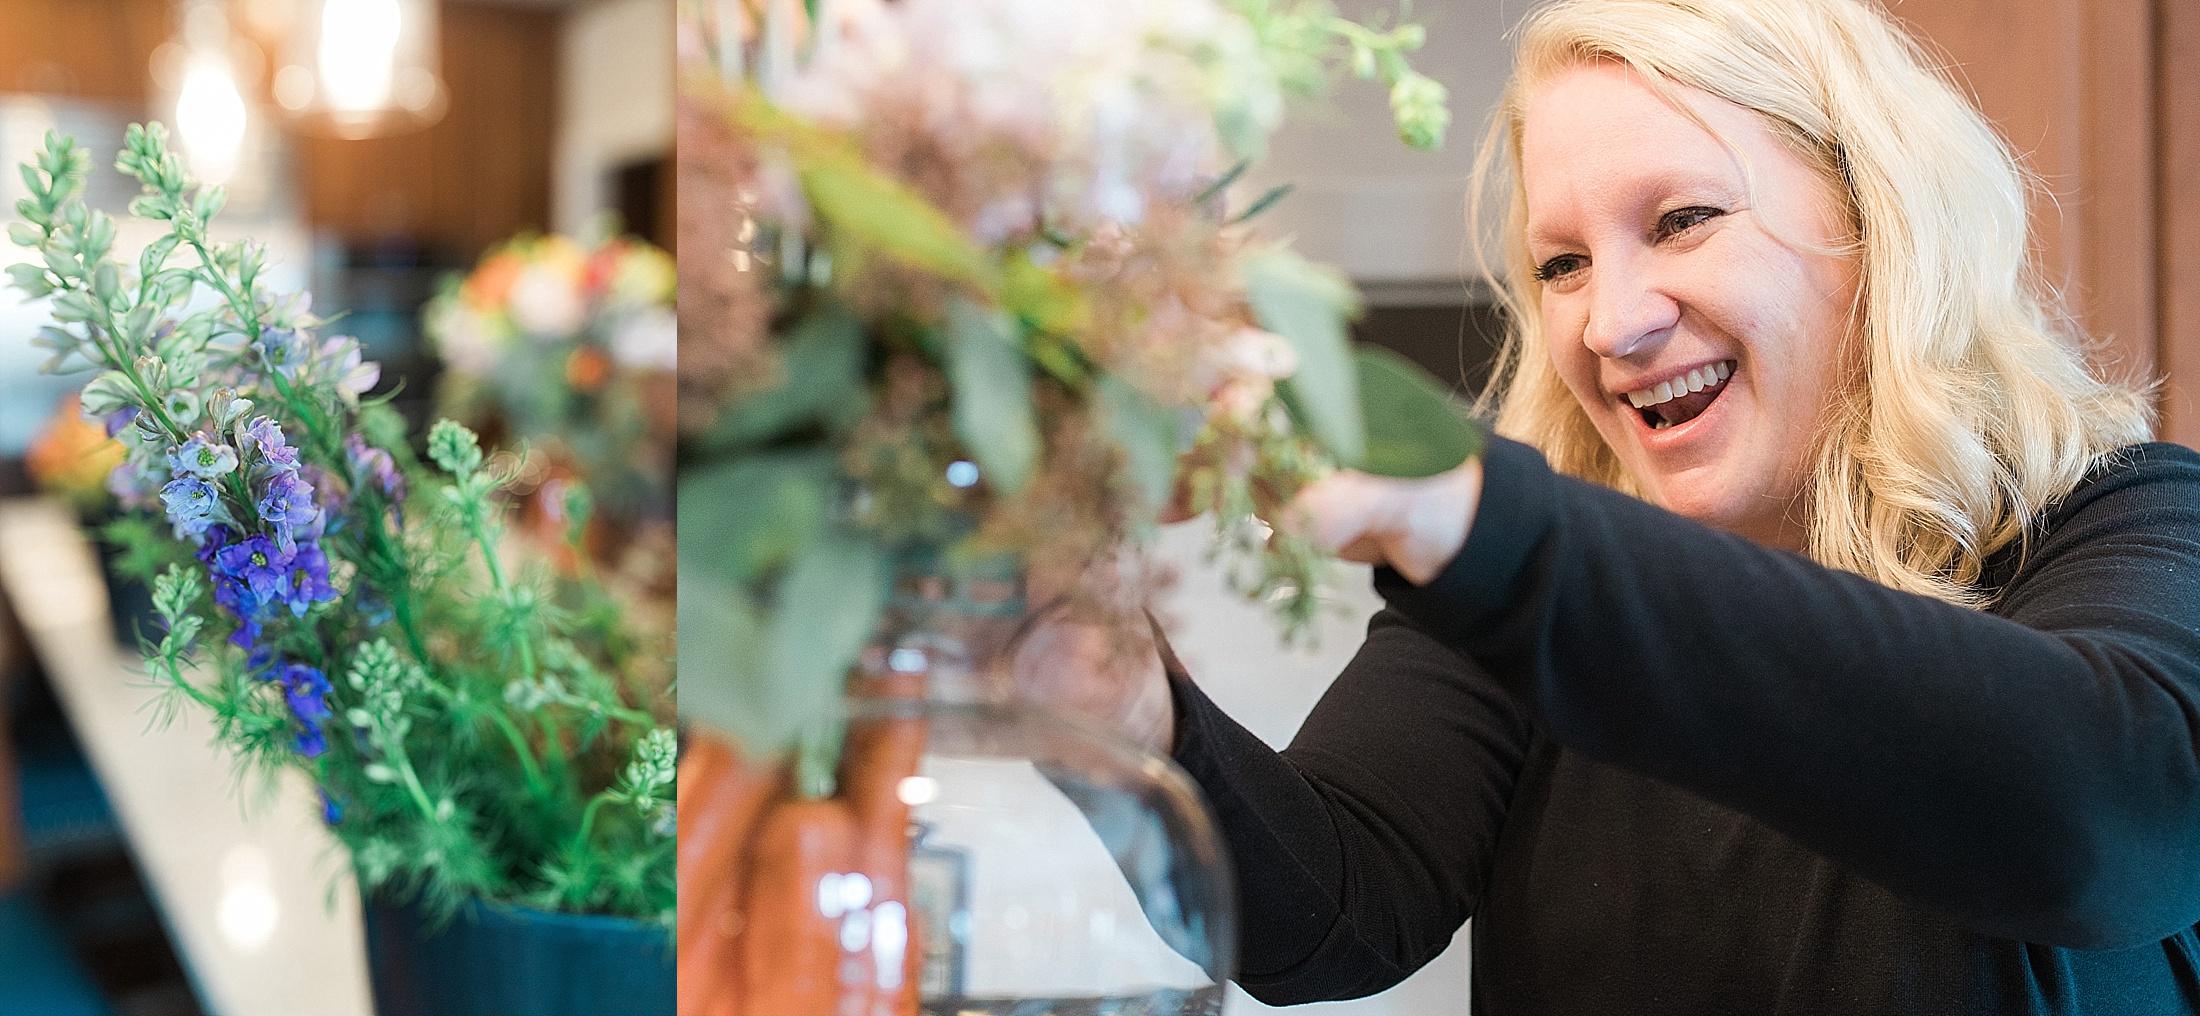 champaign-illinois-florist-watercan-designs-easter-spring-vegetable-flower-arrangement_2024.jpg